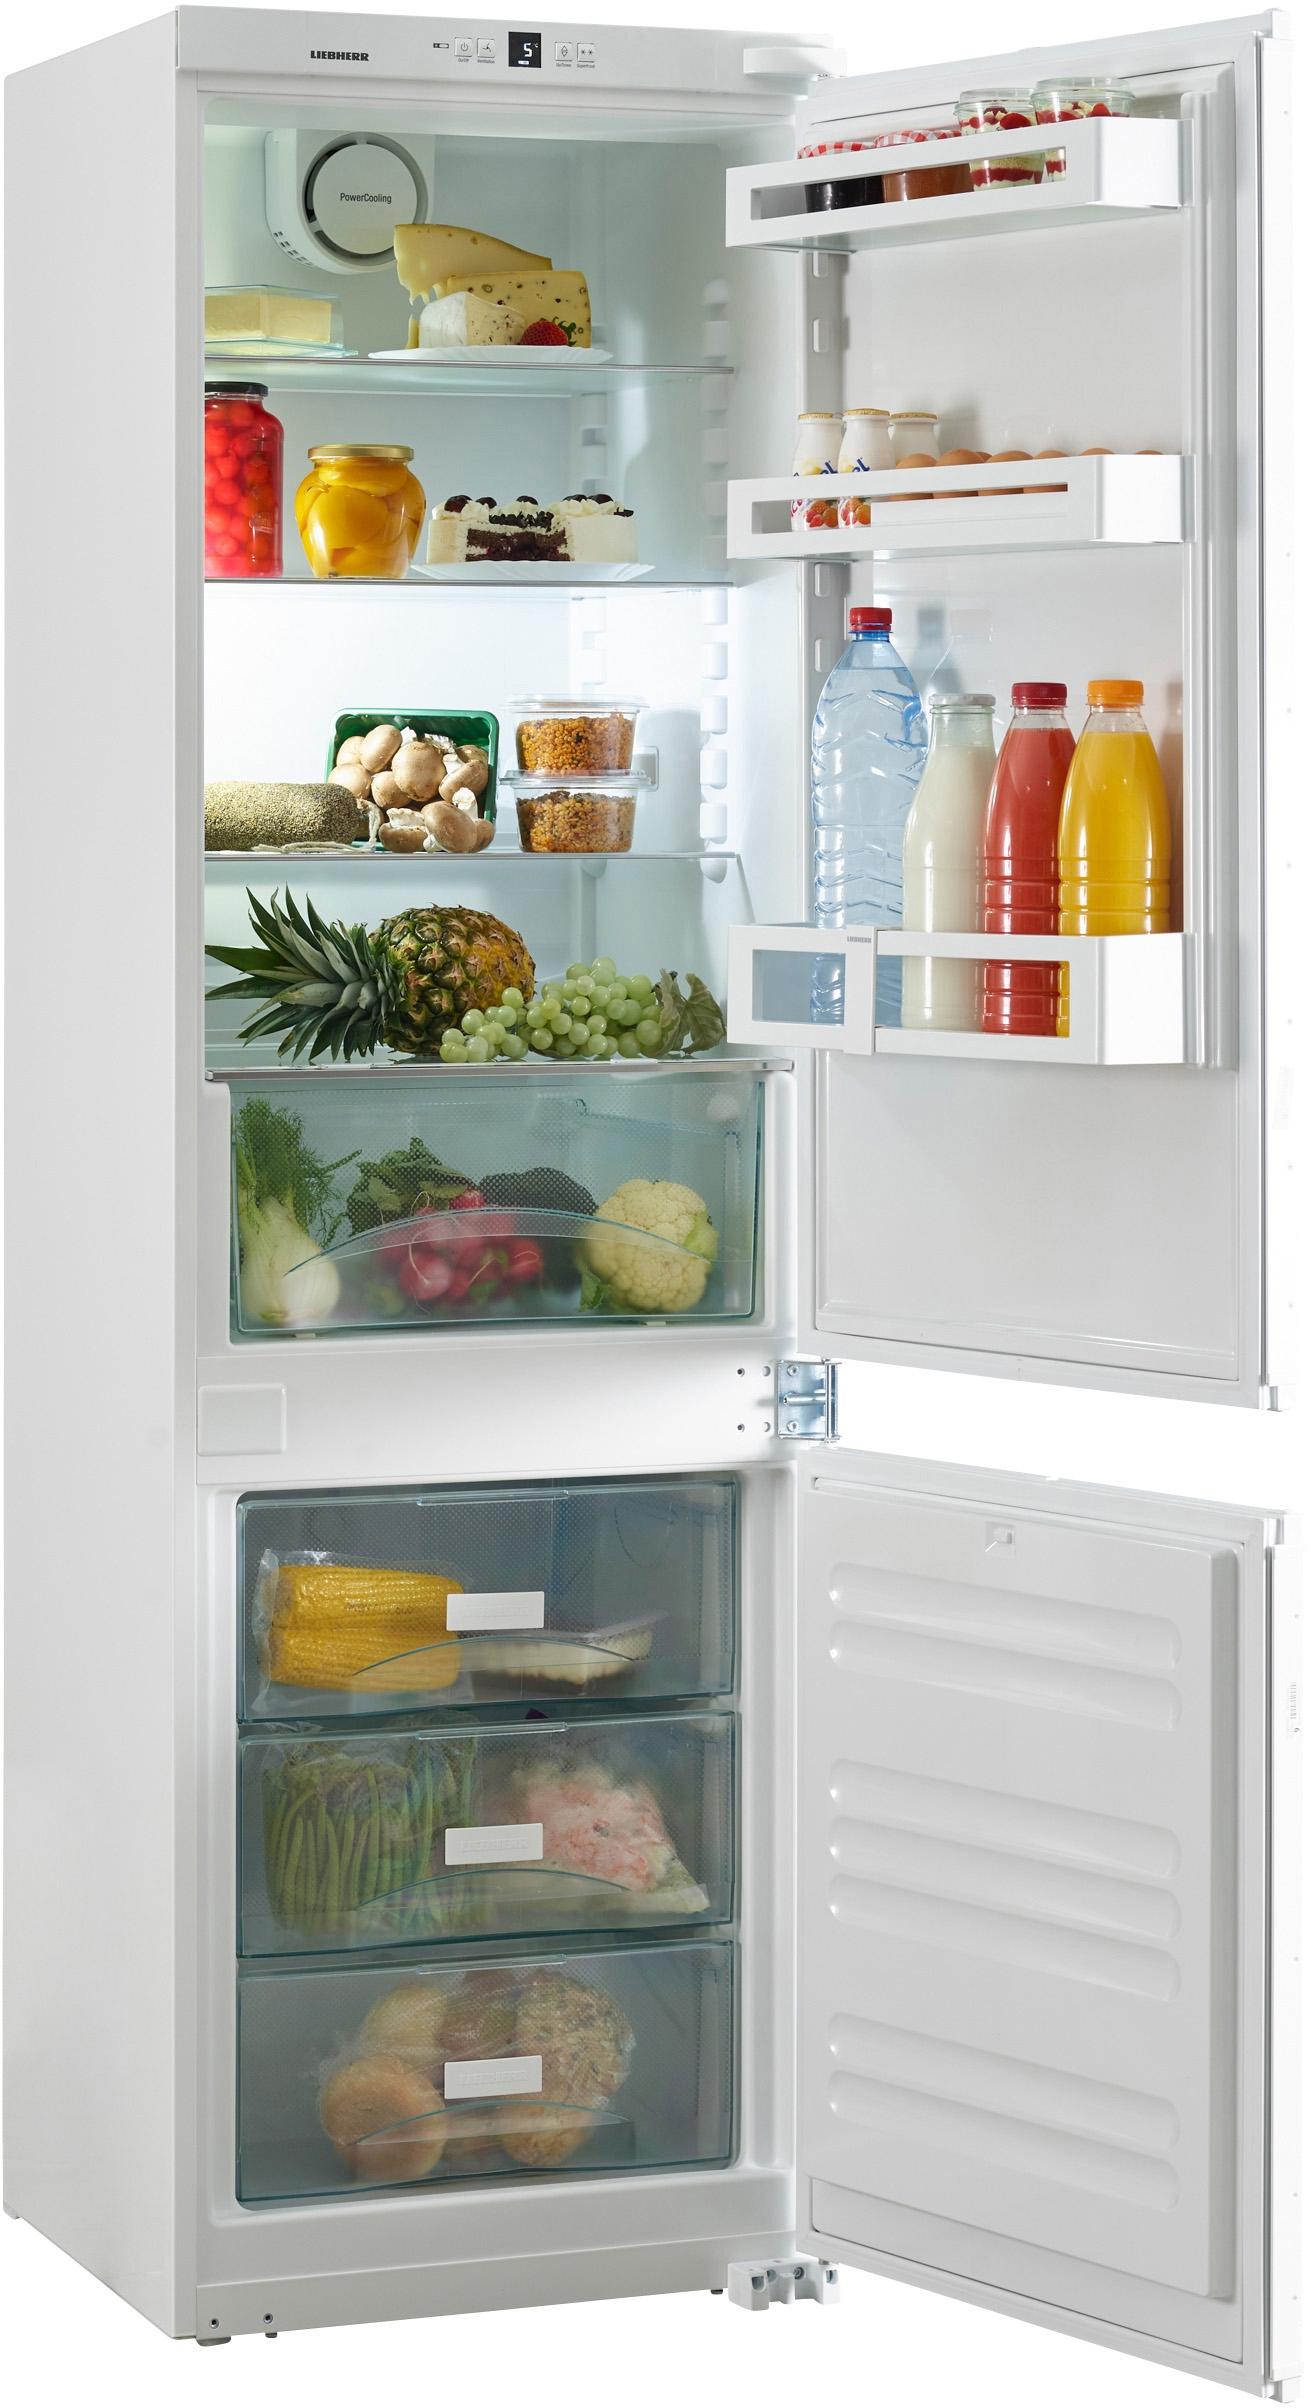 I dettagli del test sul frigorifero LIEBHERR ICUS3324